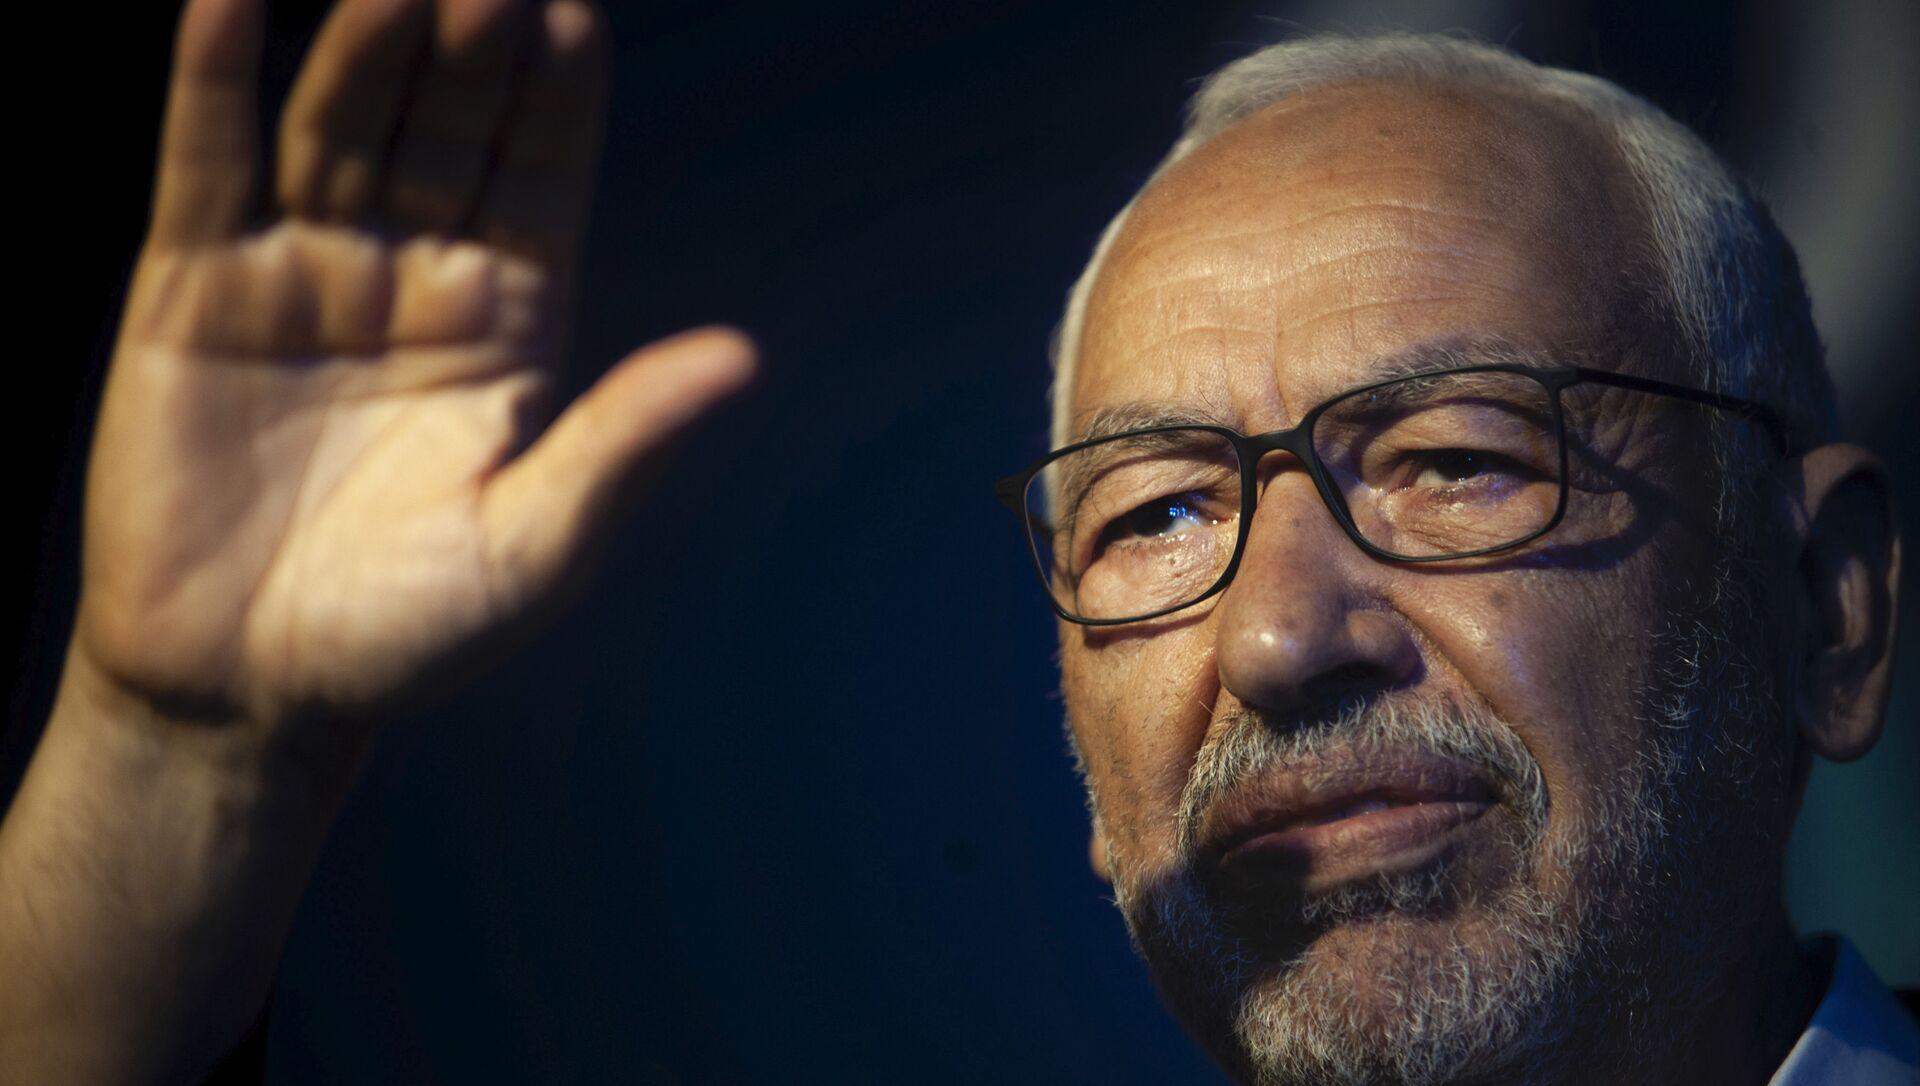 Rached Ghannouchi, président du parti islamiste tunisien Ennahda - Sputnik France, 1920, 04.02.2021